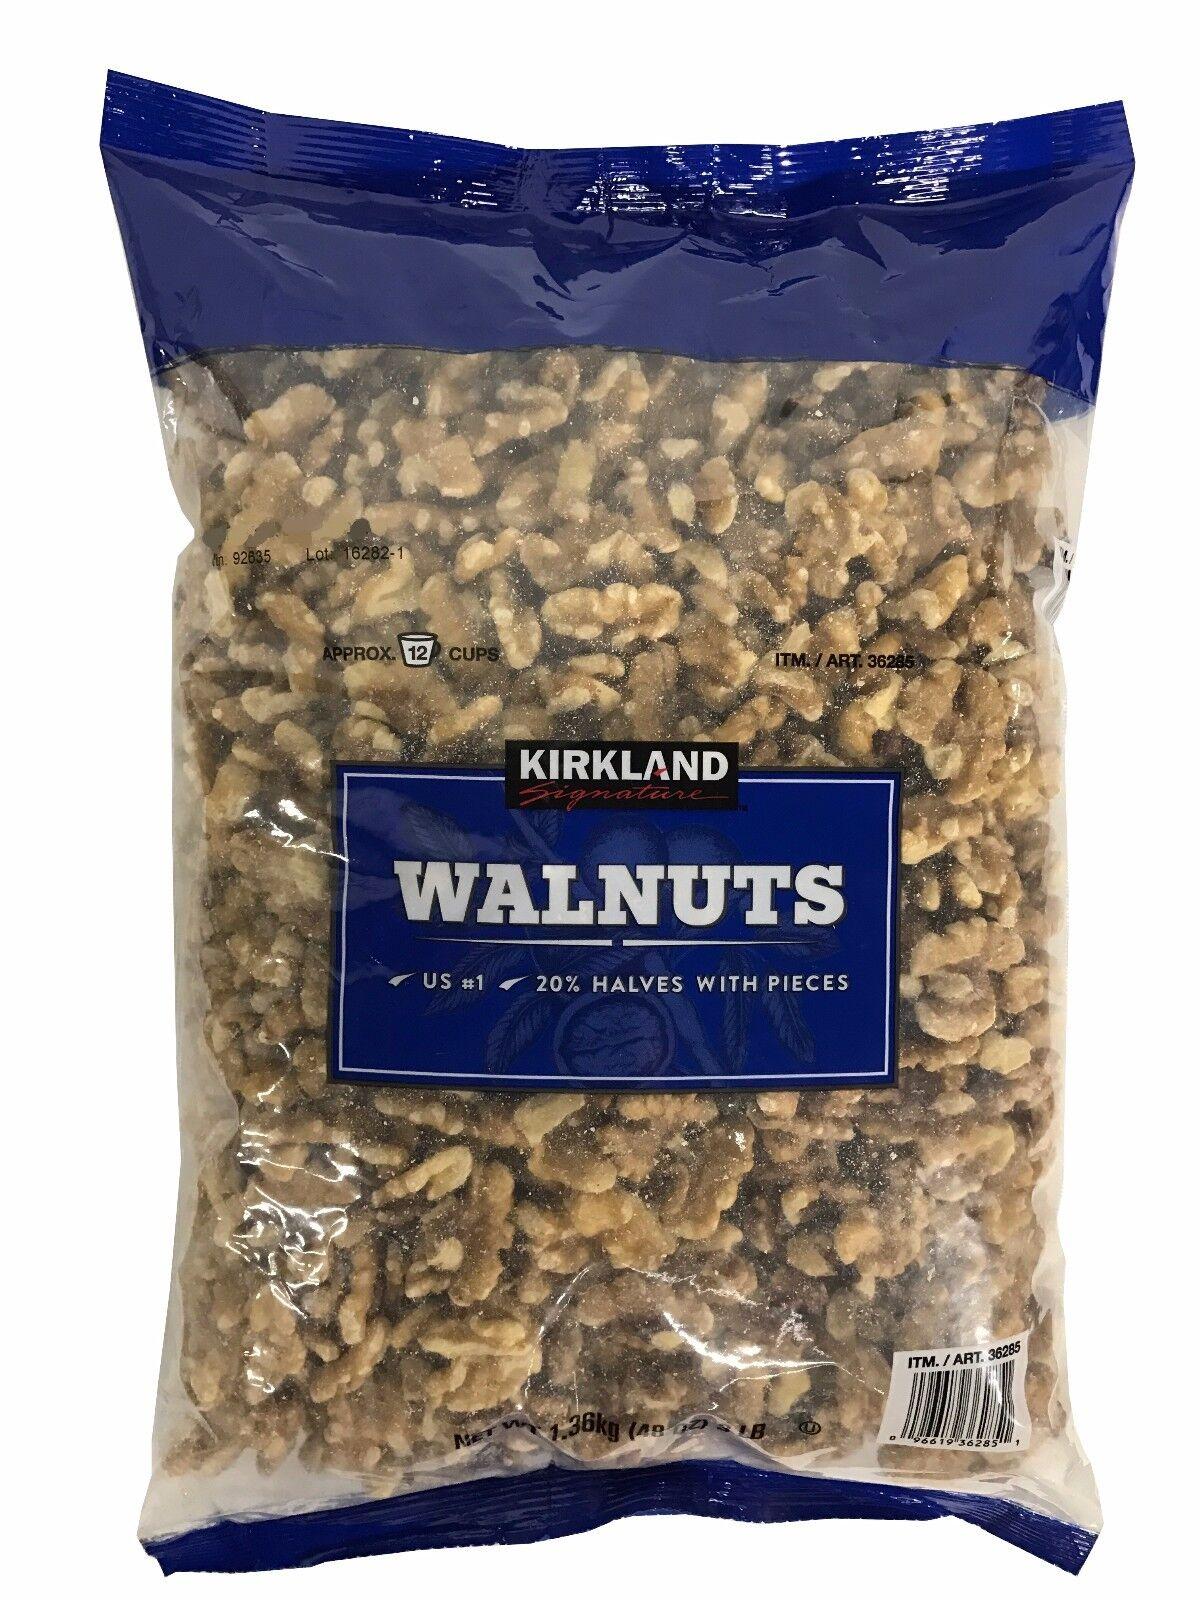 Kirkland Signature Walnuts 48oz Pack Us #1 Quality 3 Lb